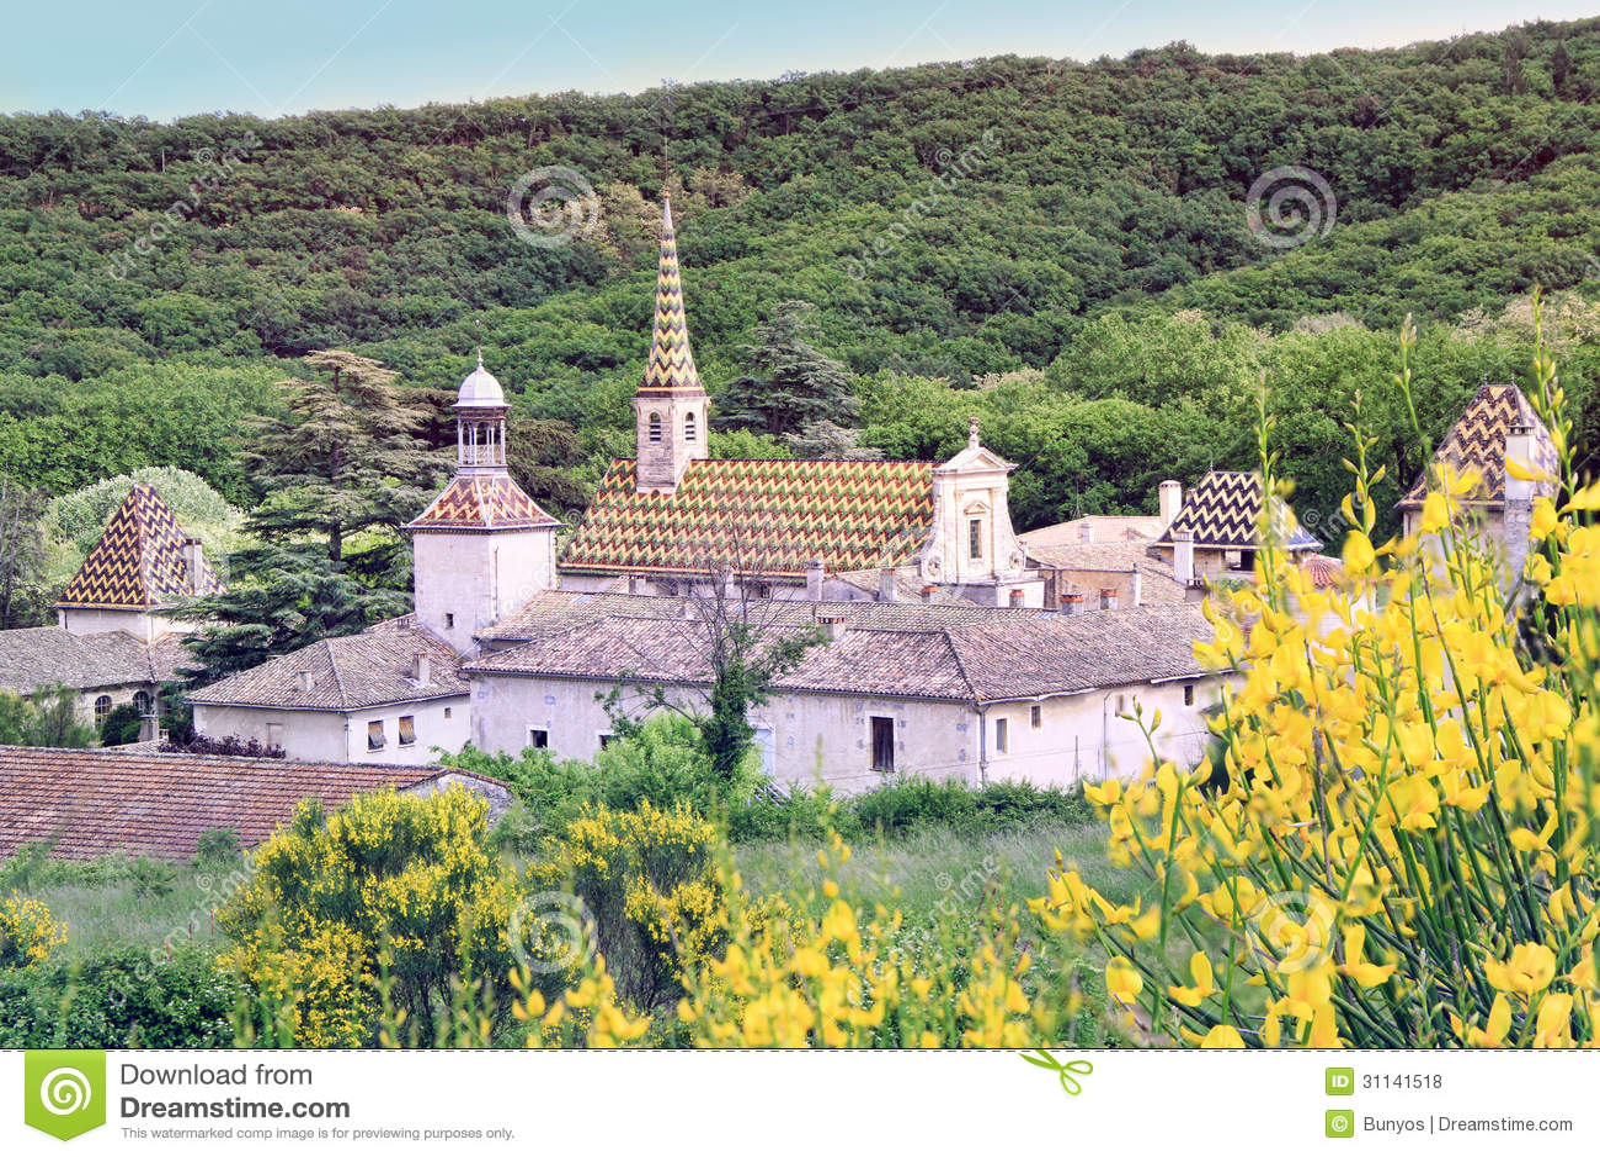 Monastery of Valbonne in Gard Provencal, France